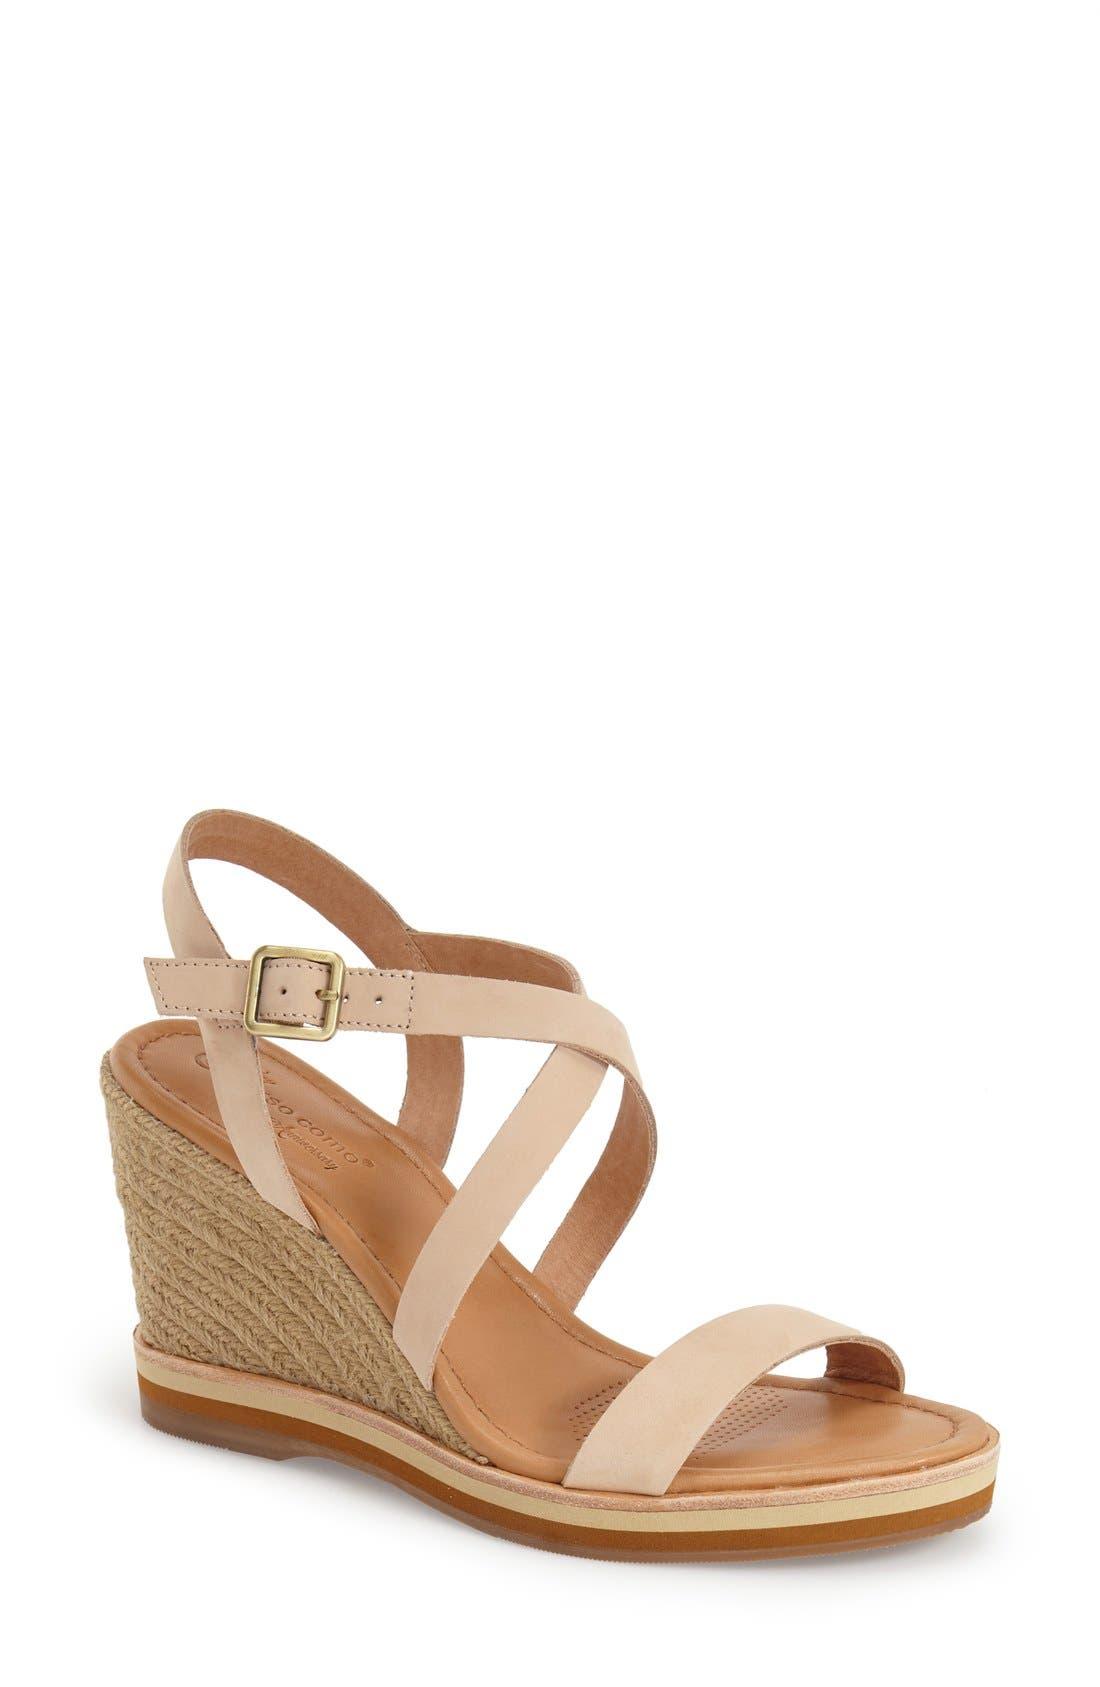 Main Image - Corso Como 'Gladis' Espadrille Wedge Sandal (Women)